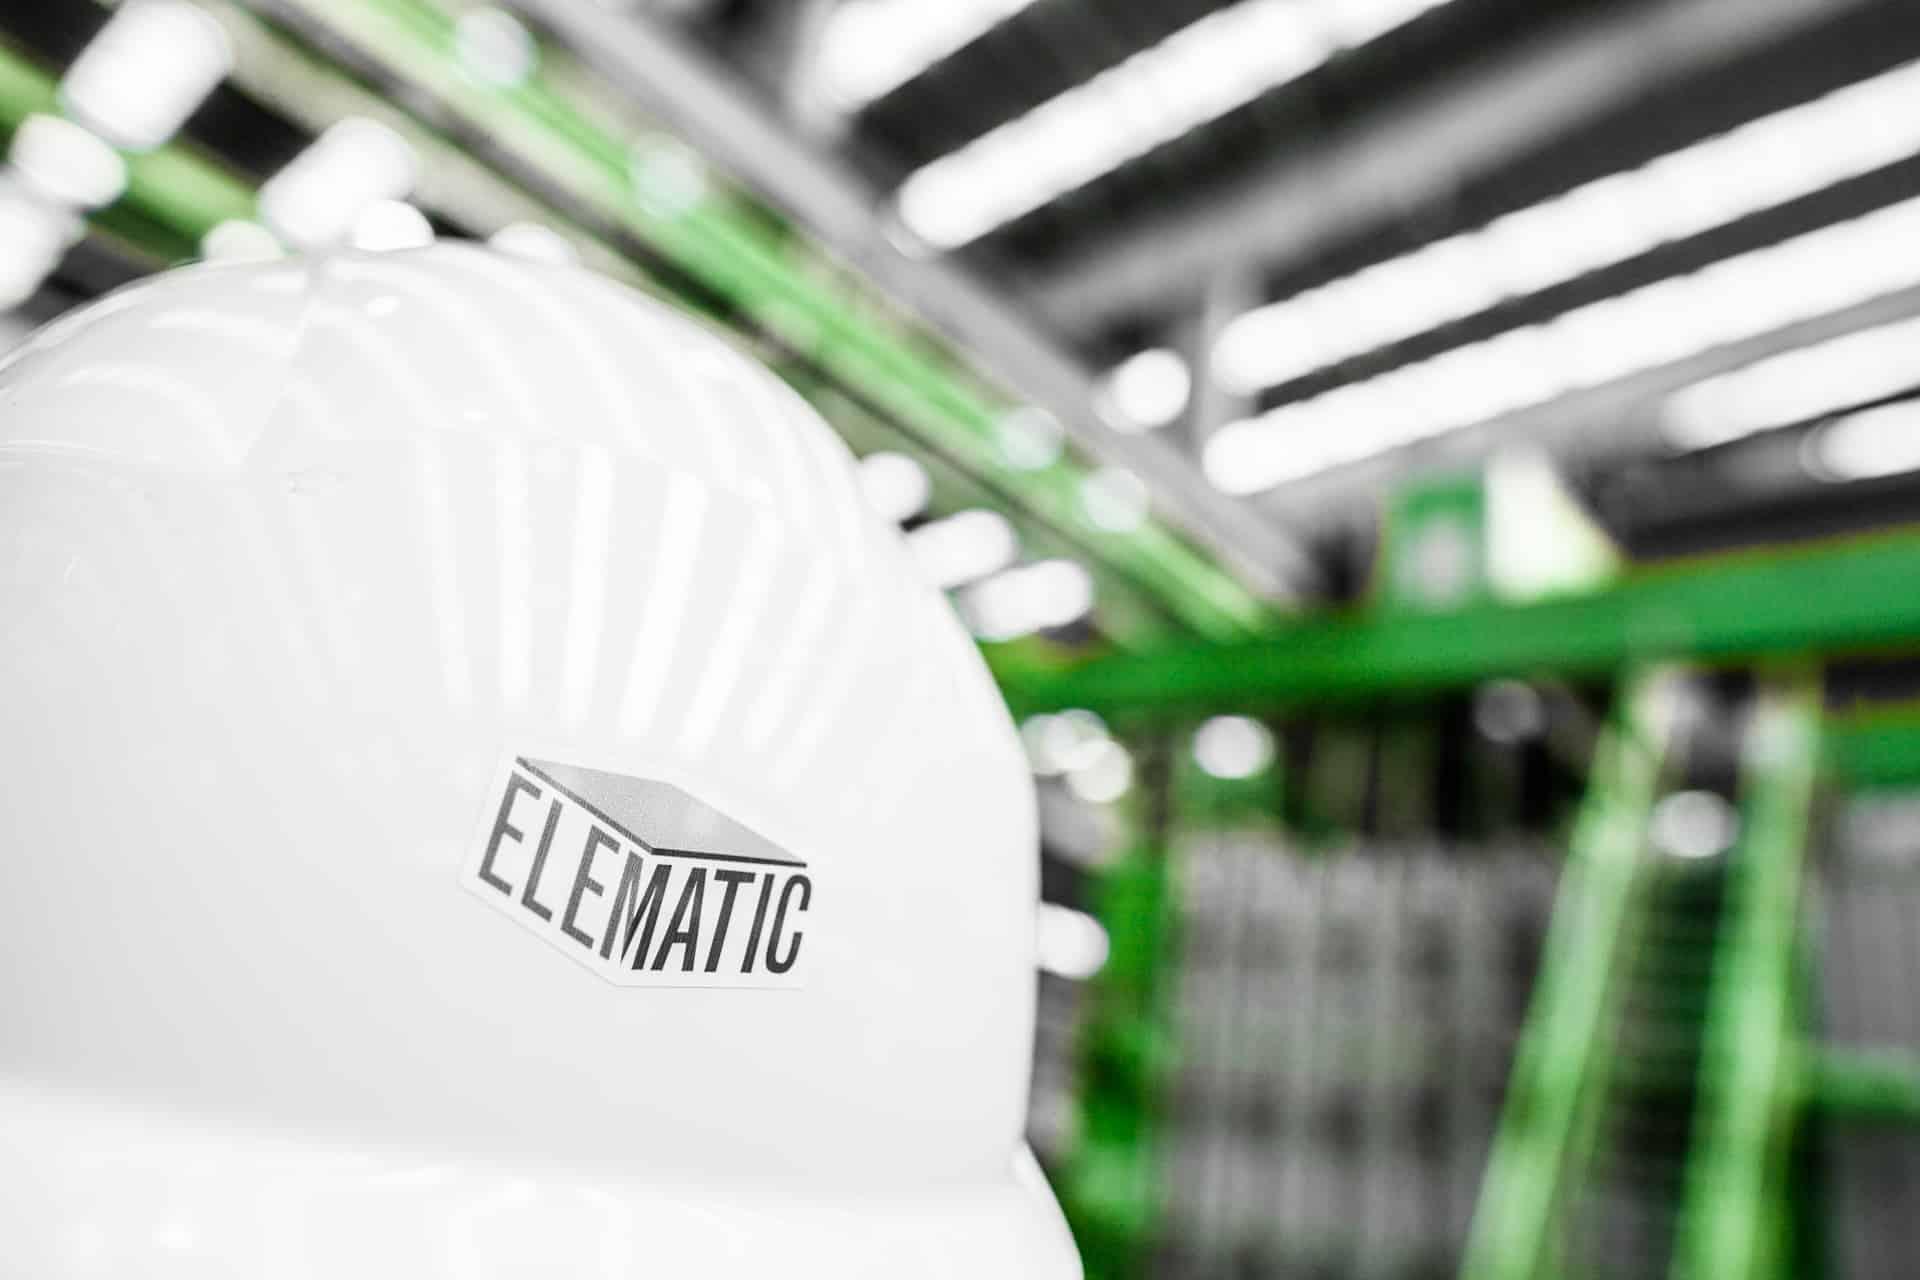 Elematic safety helmet